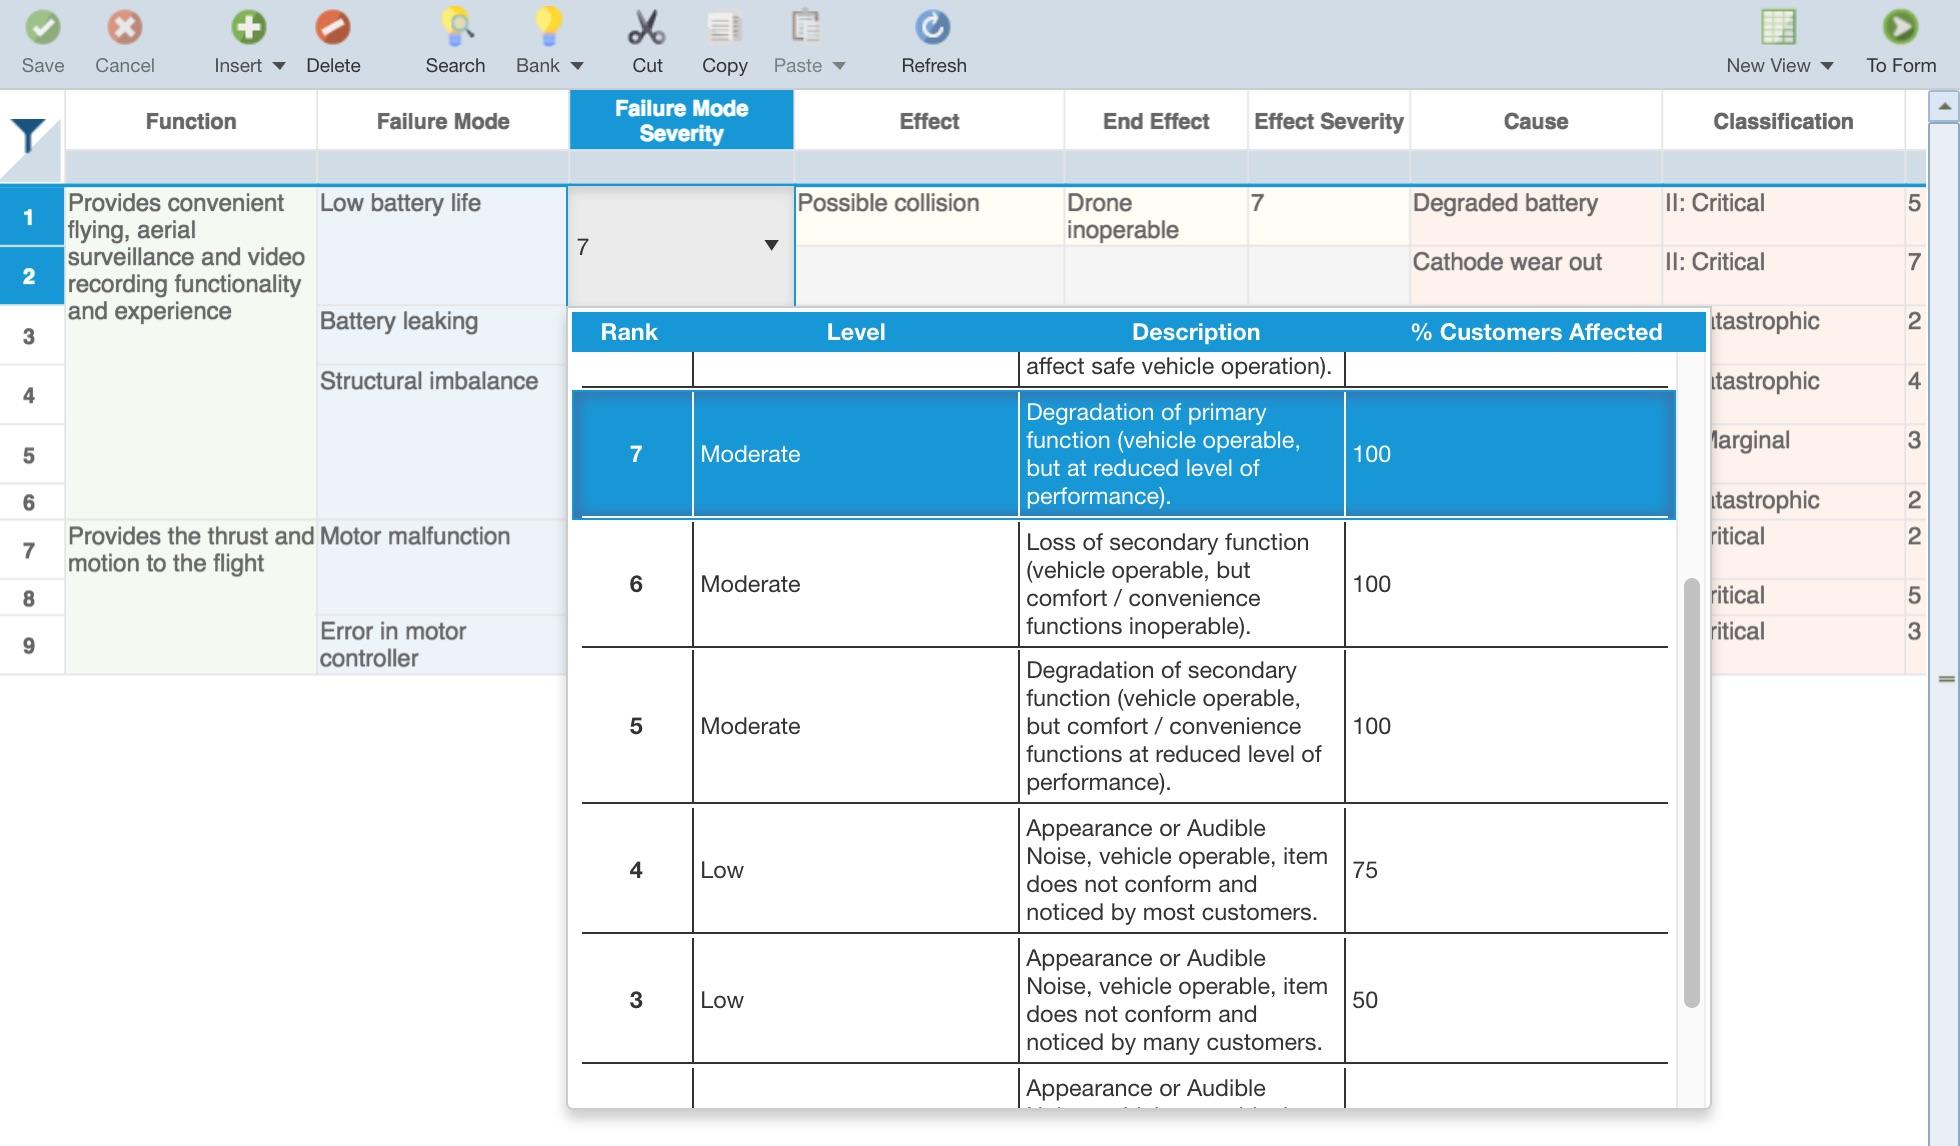 Customizing Fmea Risk Criteria